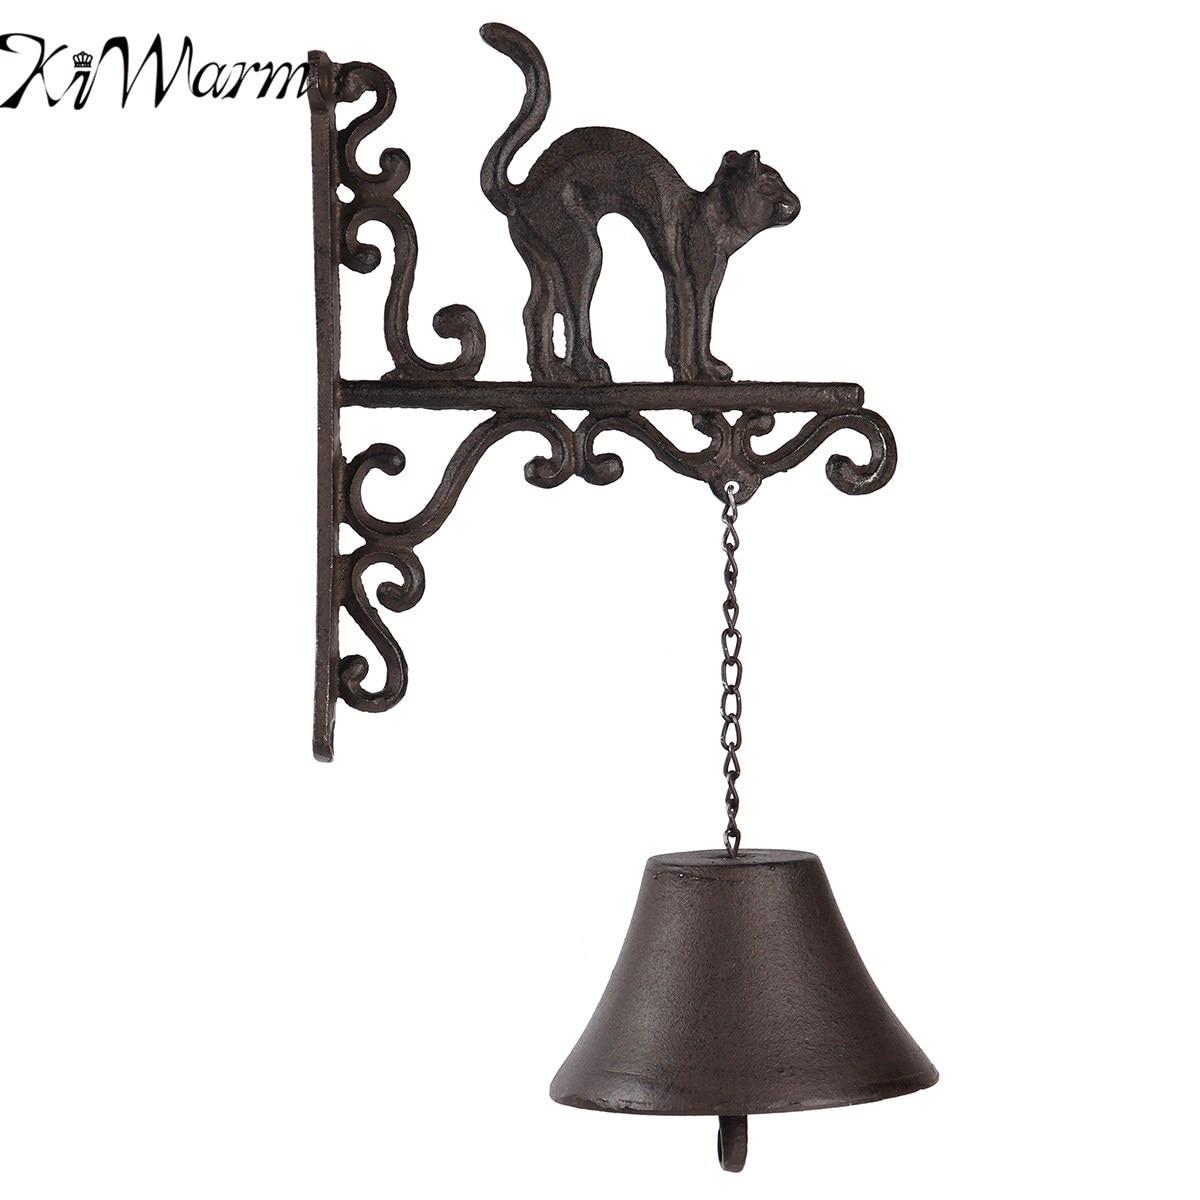 KiWarm Hot Sale Cast Iron Door Bell Metal Wall Mounted Bend Back Cat Design for Home Garden Hanging Ornament